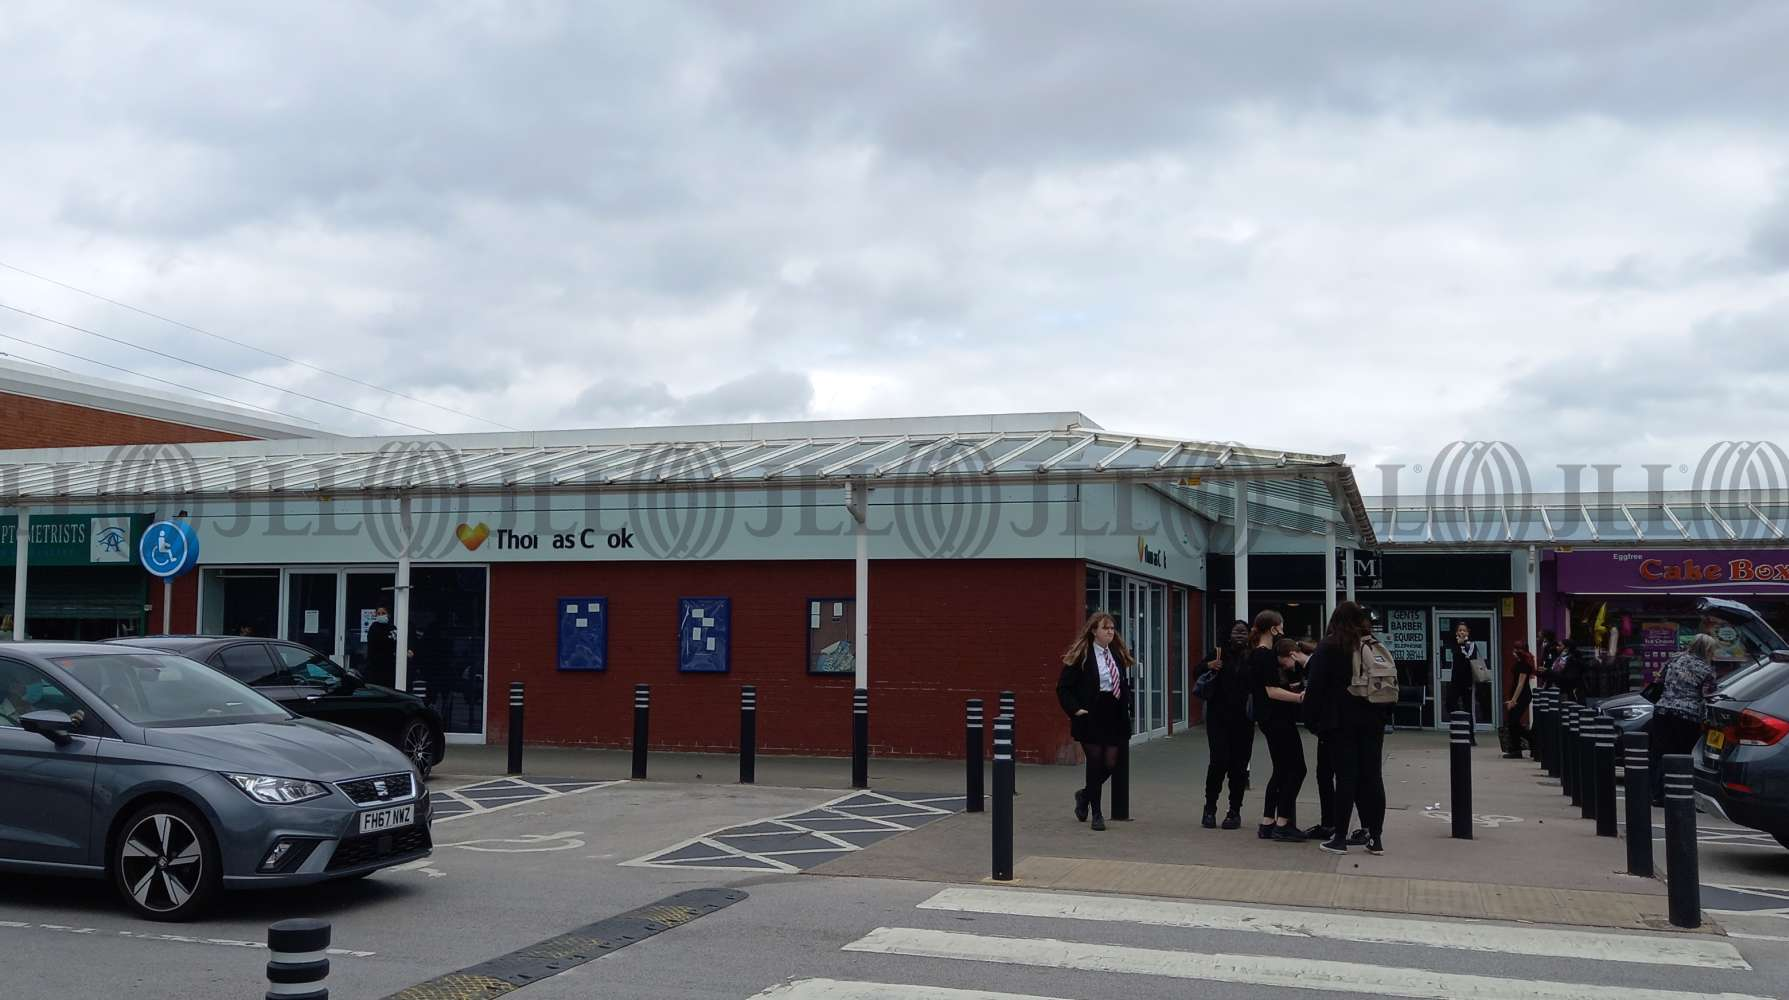 Retail shopping centre Derby, sinfin, DE24 3DS - 16 Sinfin District Centre